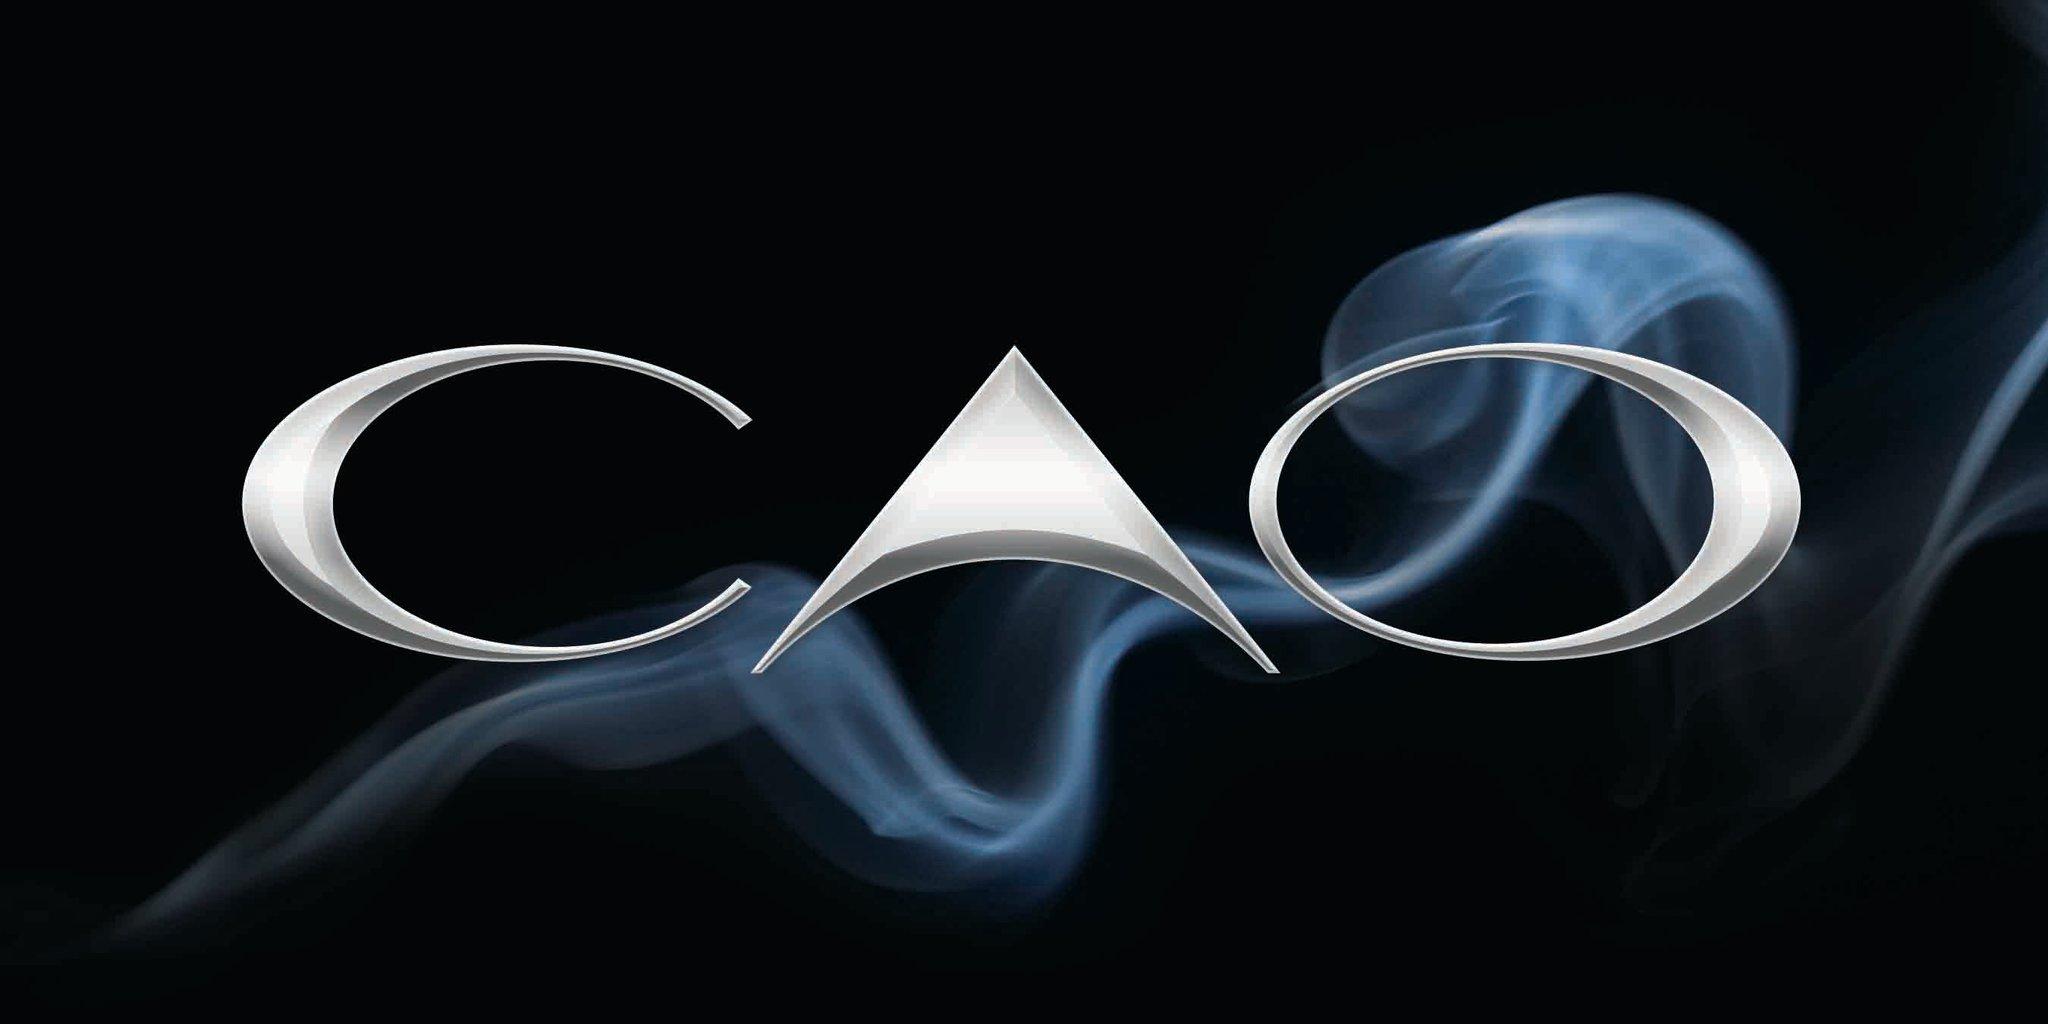 logo-cao.jpg